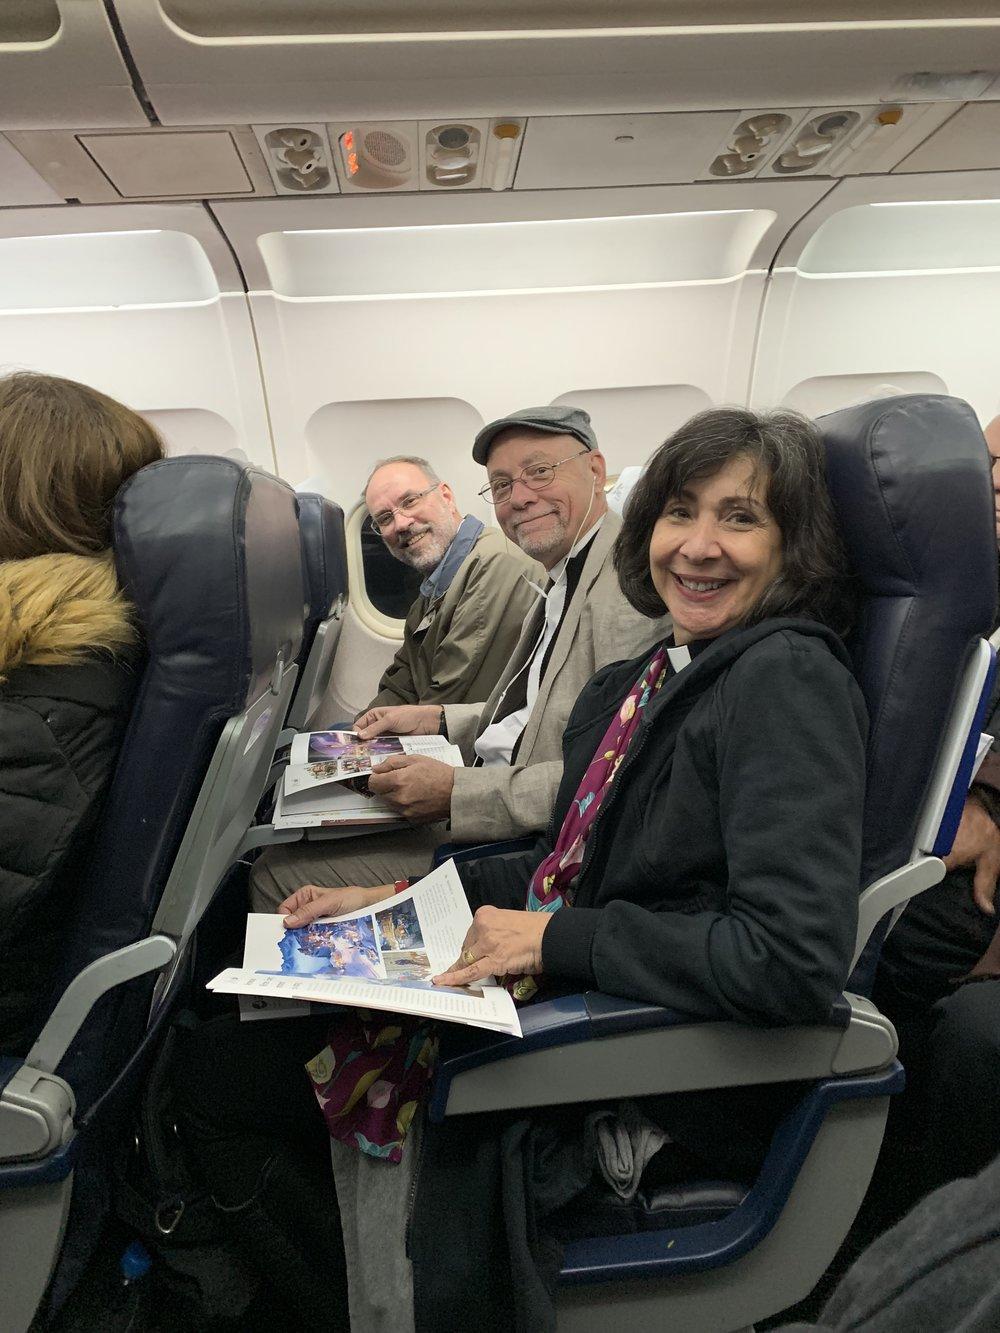 Steve, Carlos and Lisa hold down row 4